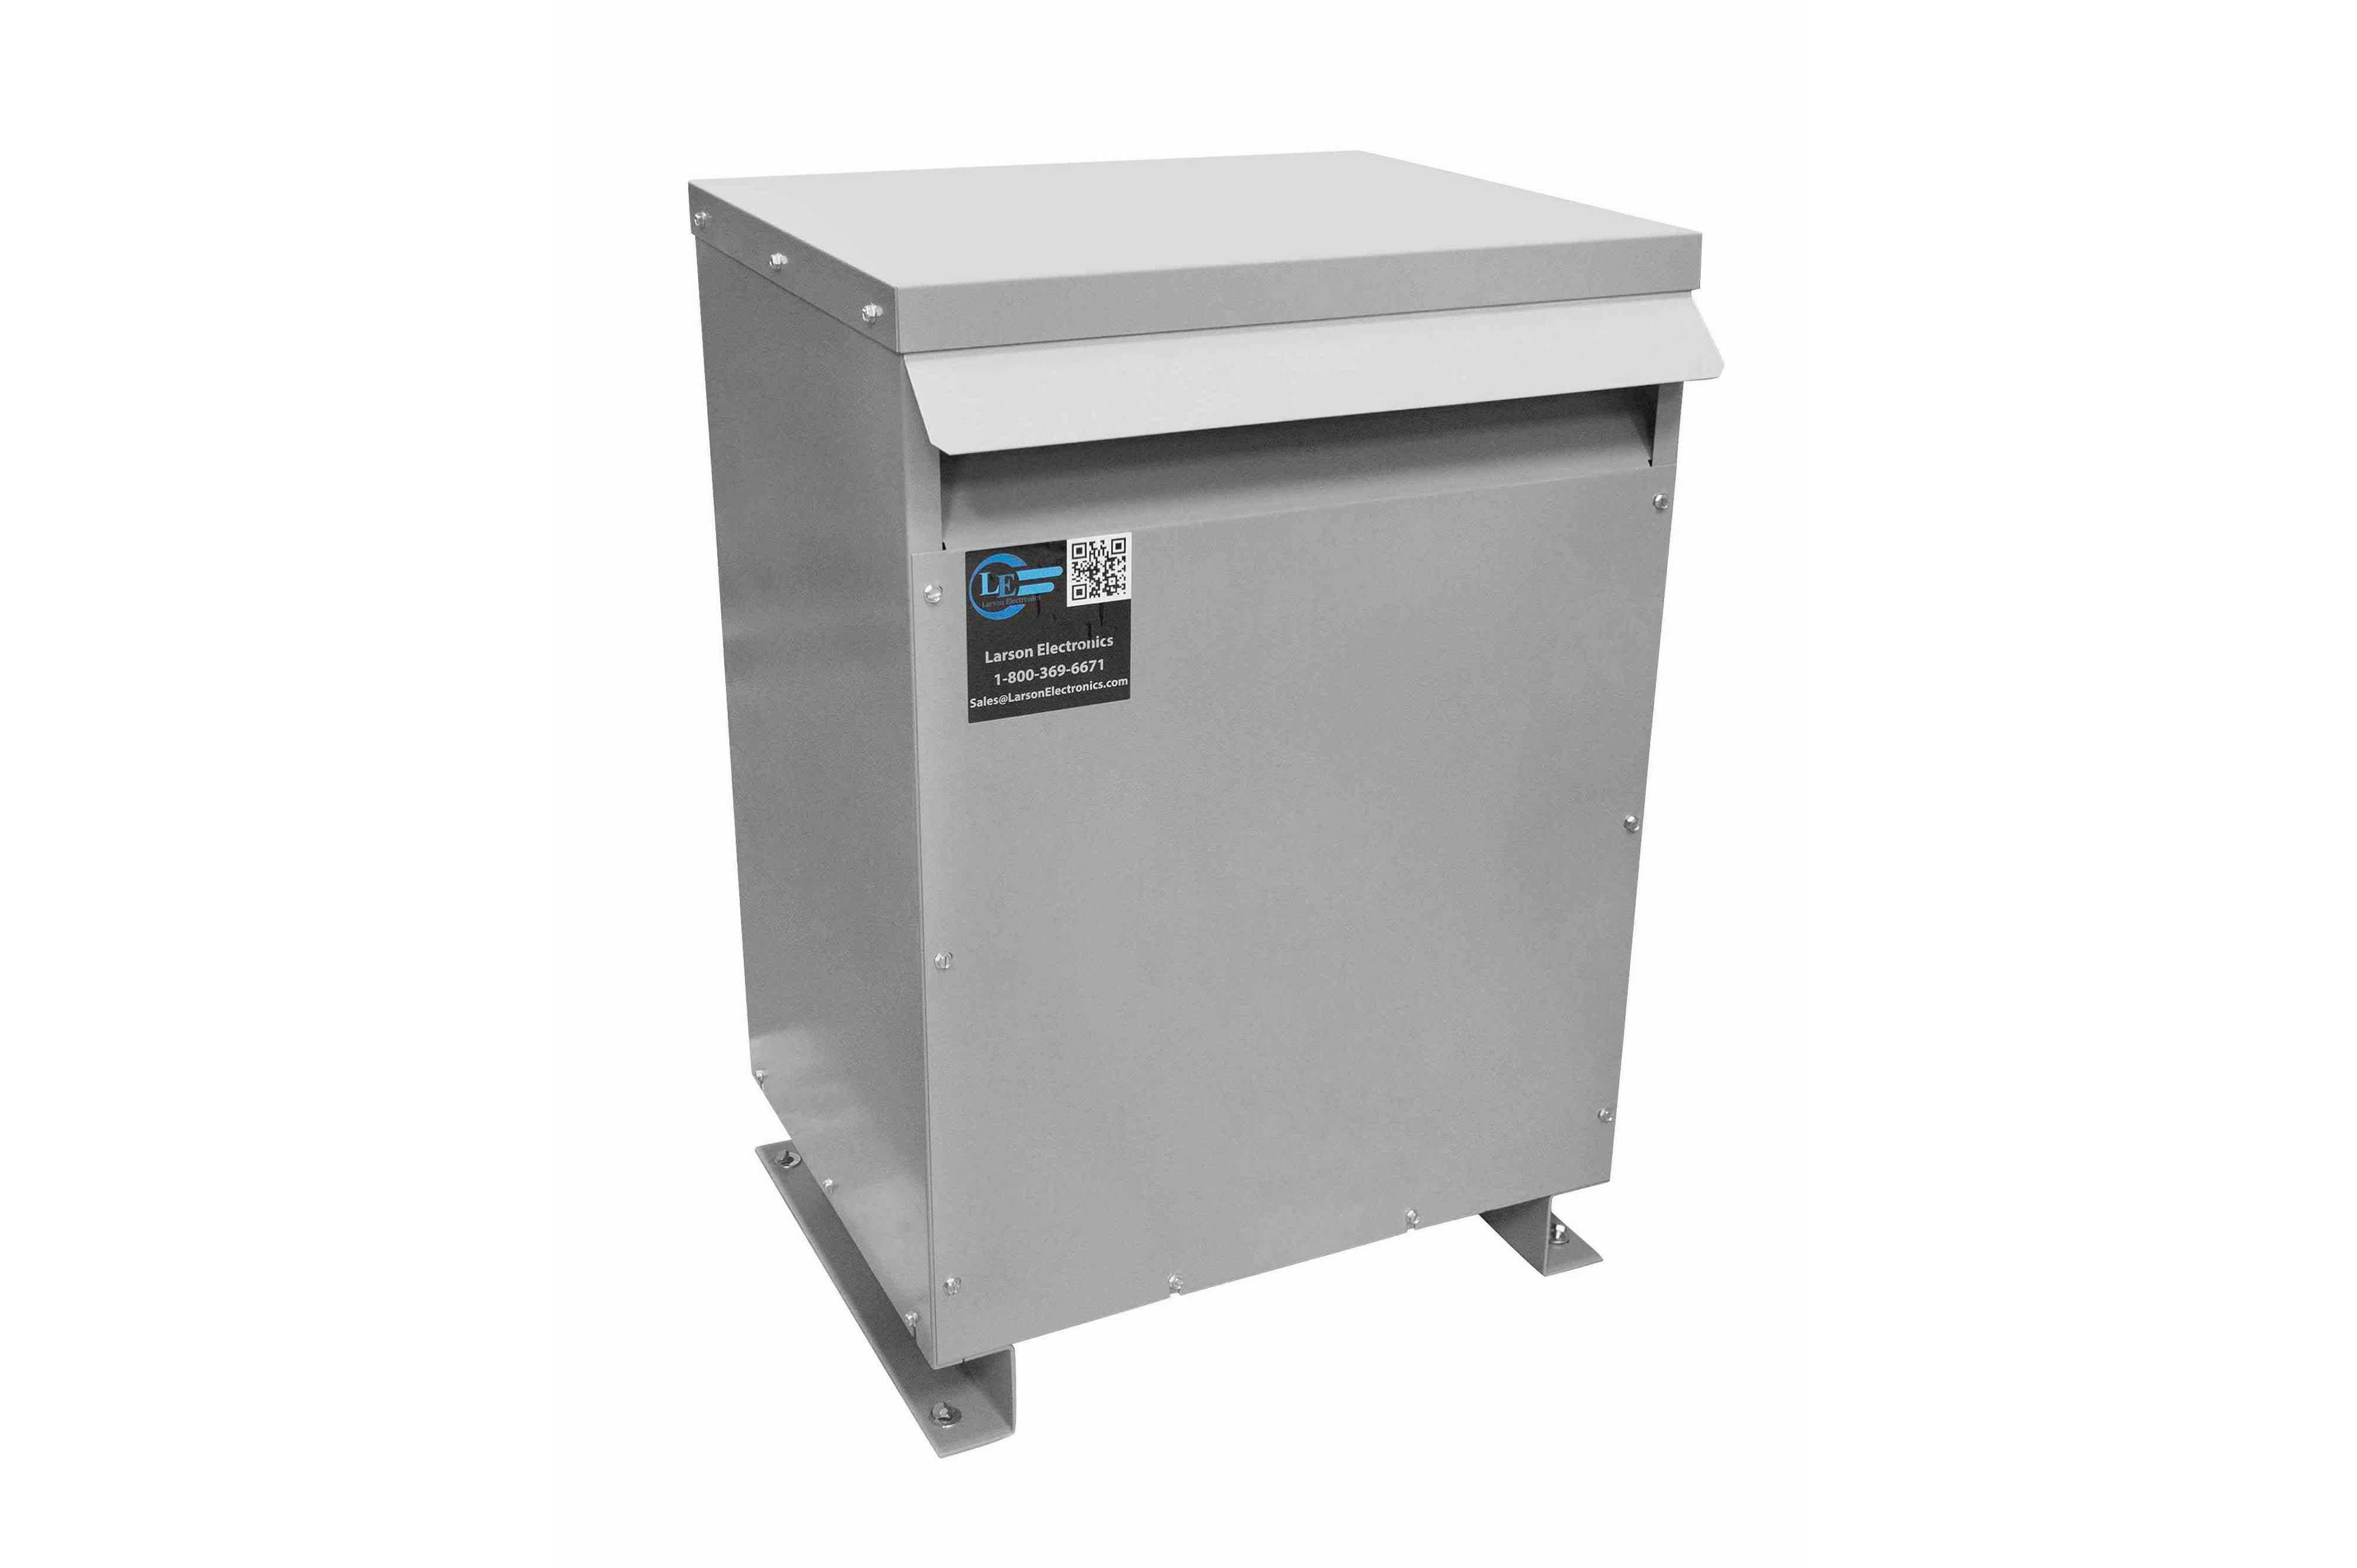 22.5 kVA 3PH Isolation Transformer, 460V Wye Primary, 380V Delta Secondary, N3R, Ventilated, 60 Hz